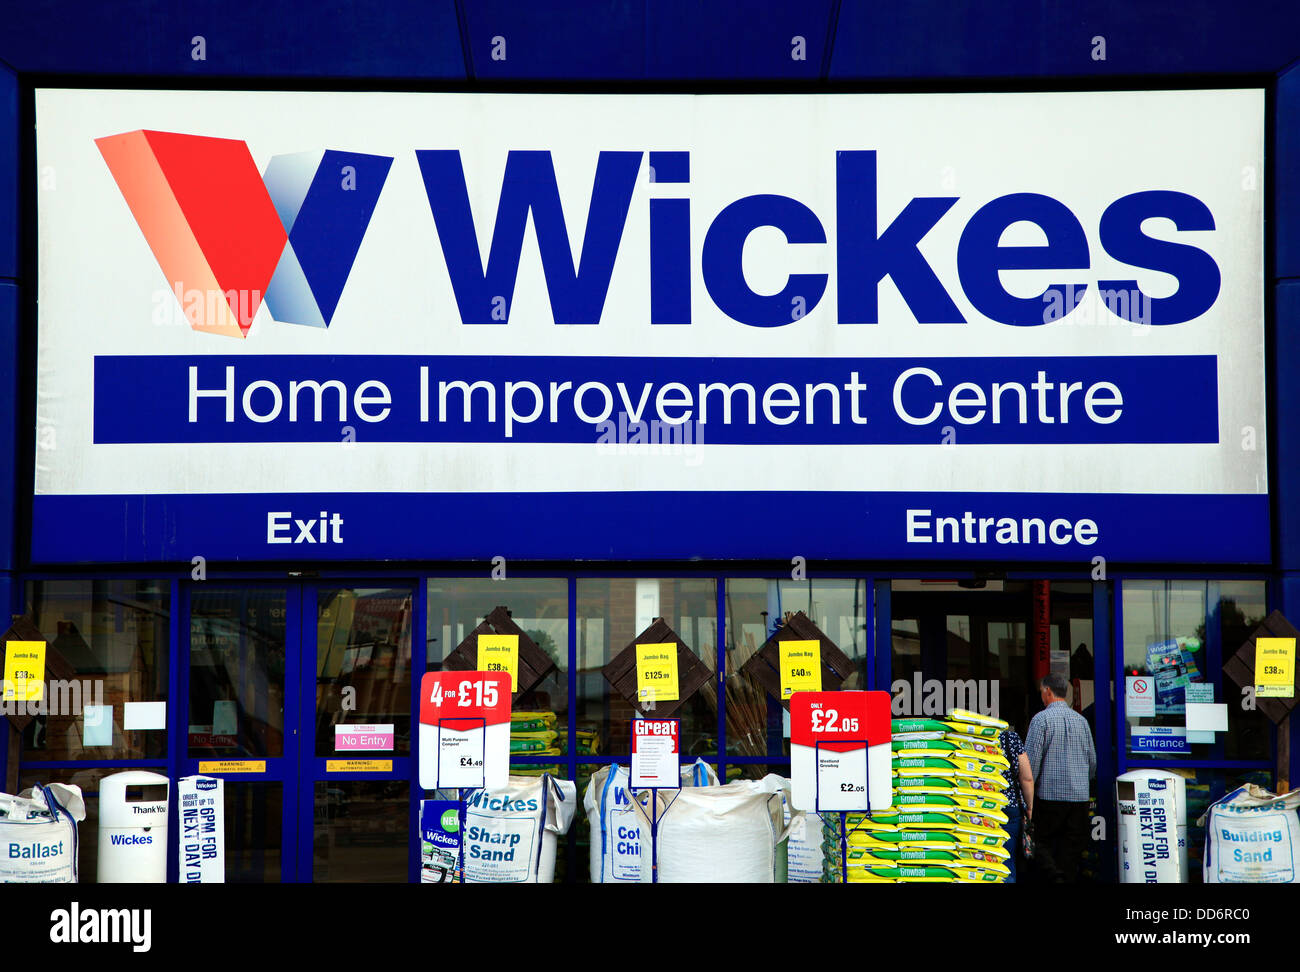 Wickes, store sign, logo, England UK - Stock Image